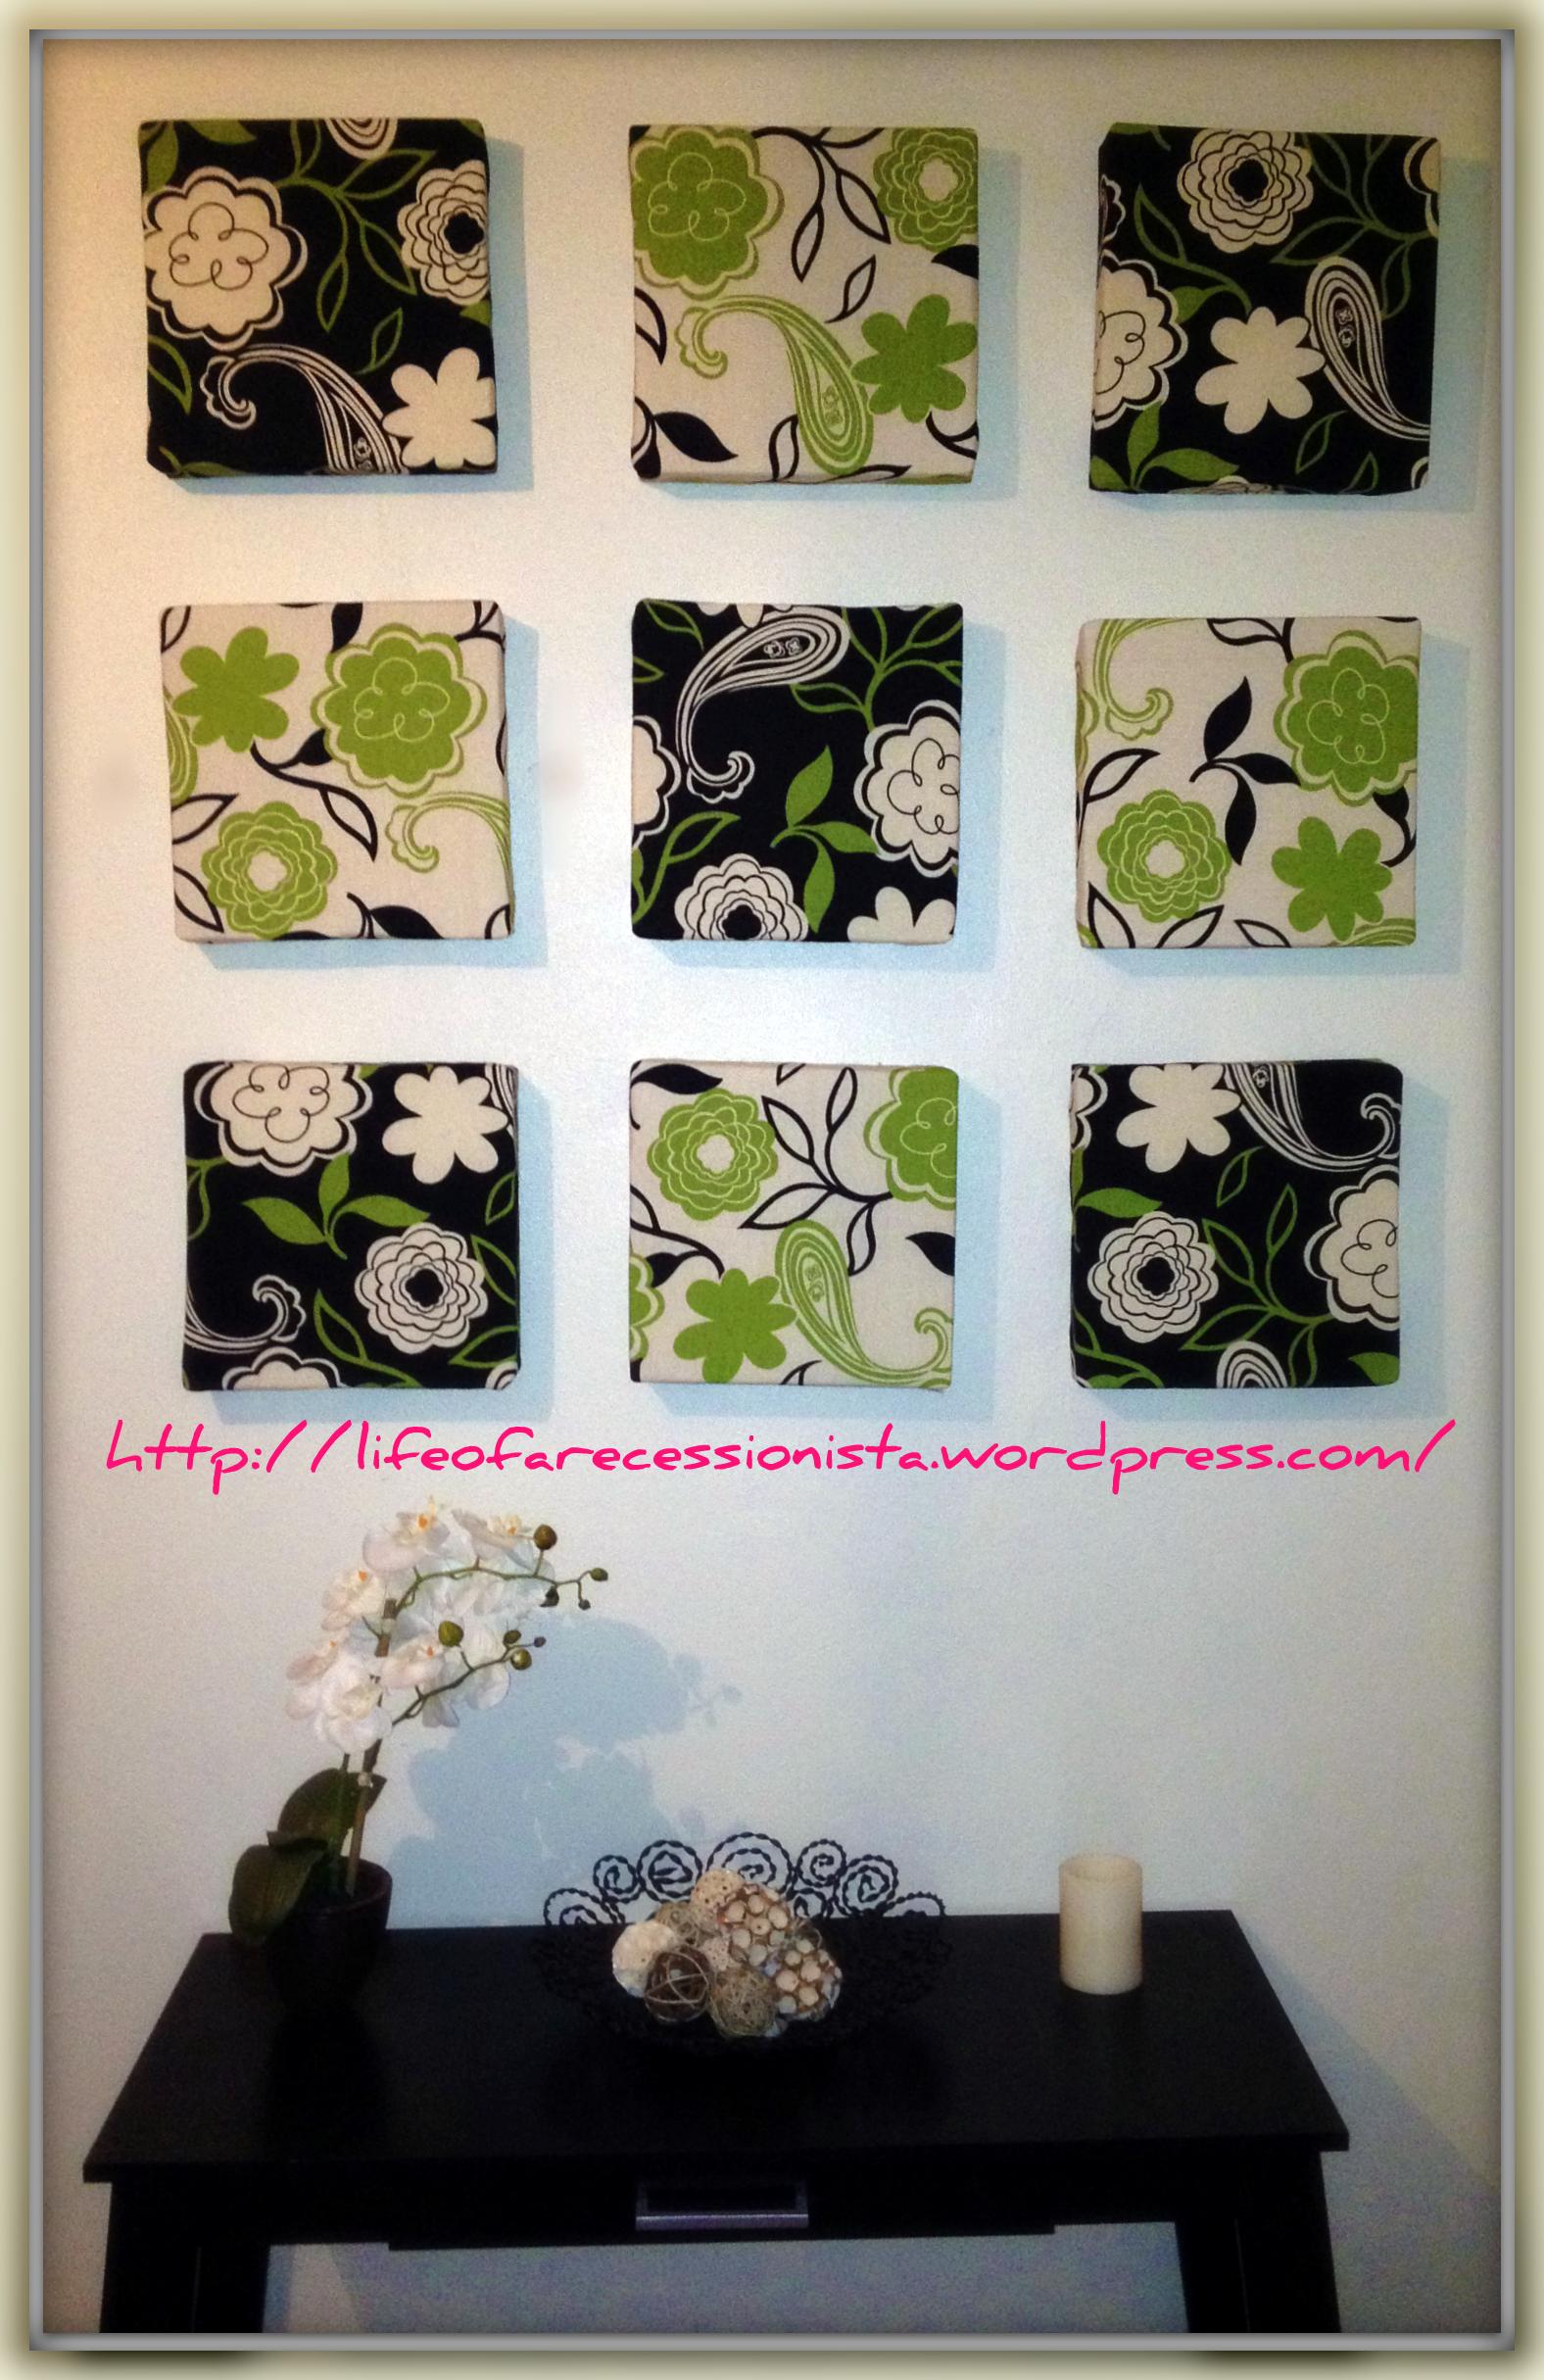 Easy DIY Wall Art | Life of a Recessionista on Pinterest Wall Decor  id=93489